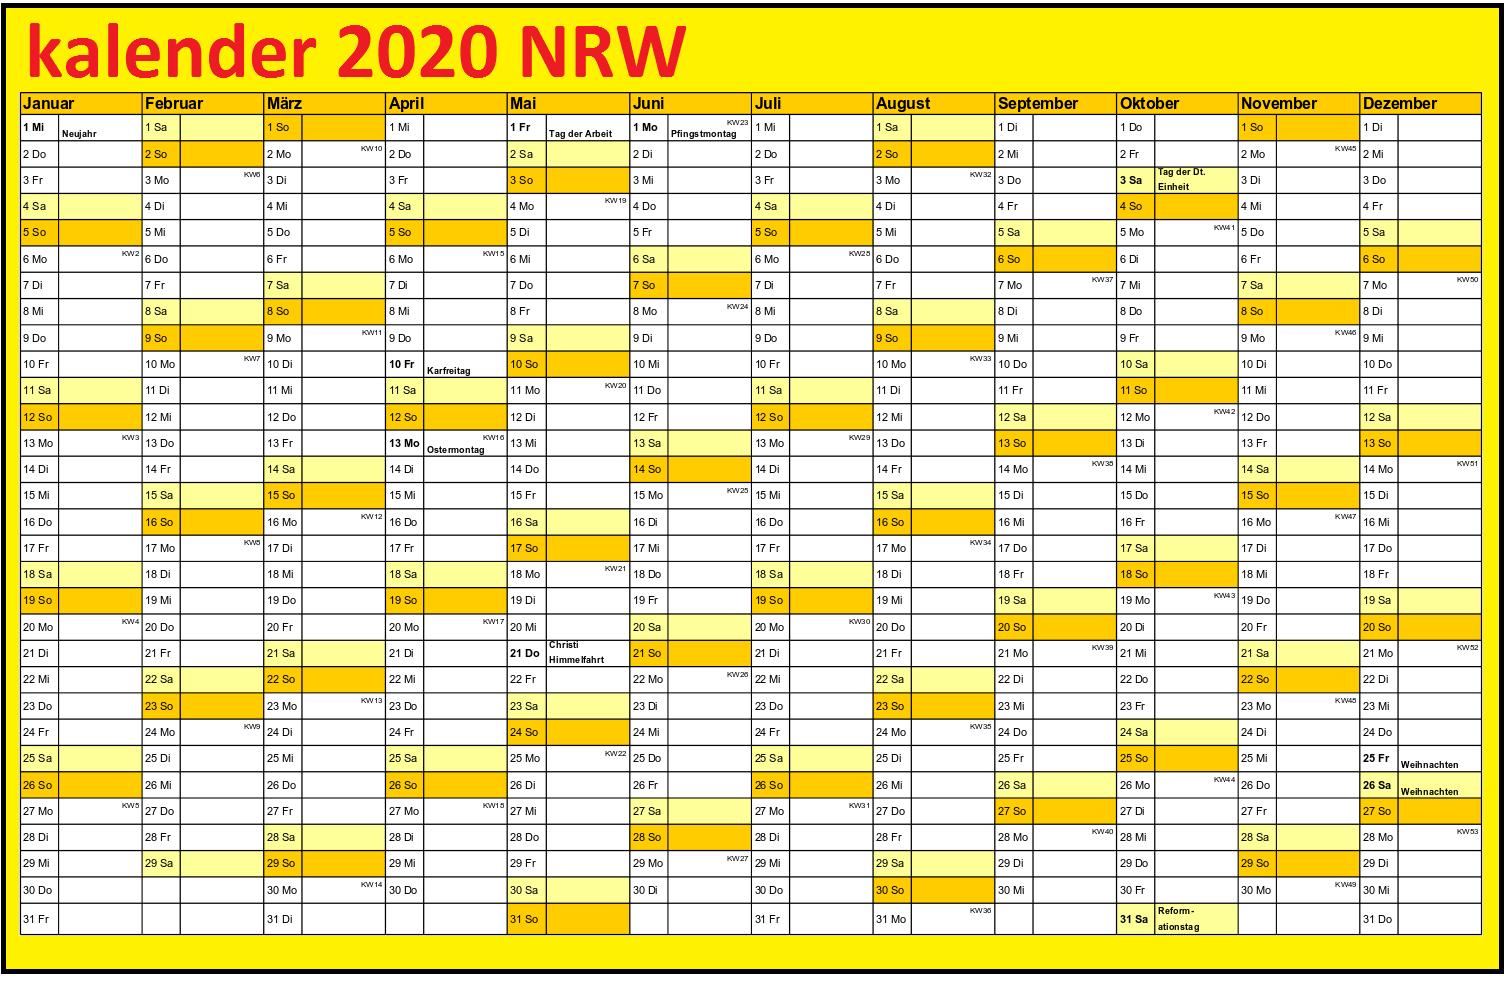 Jahreskalender 2020 NRW PDF